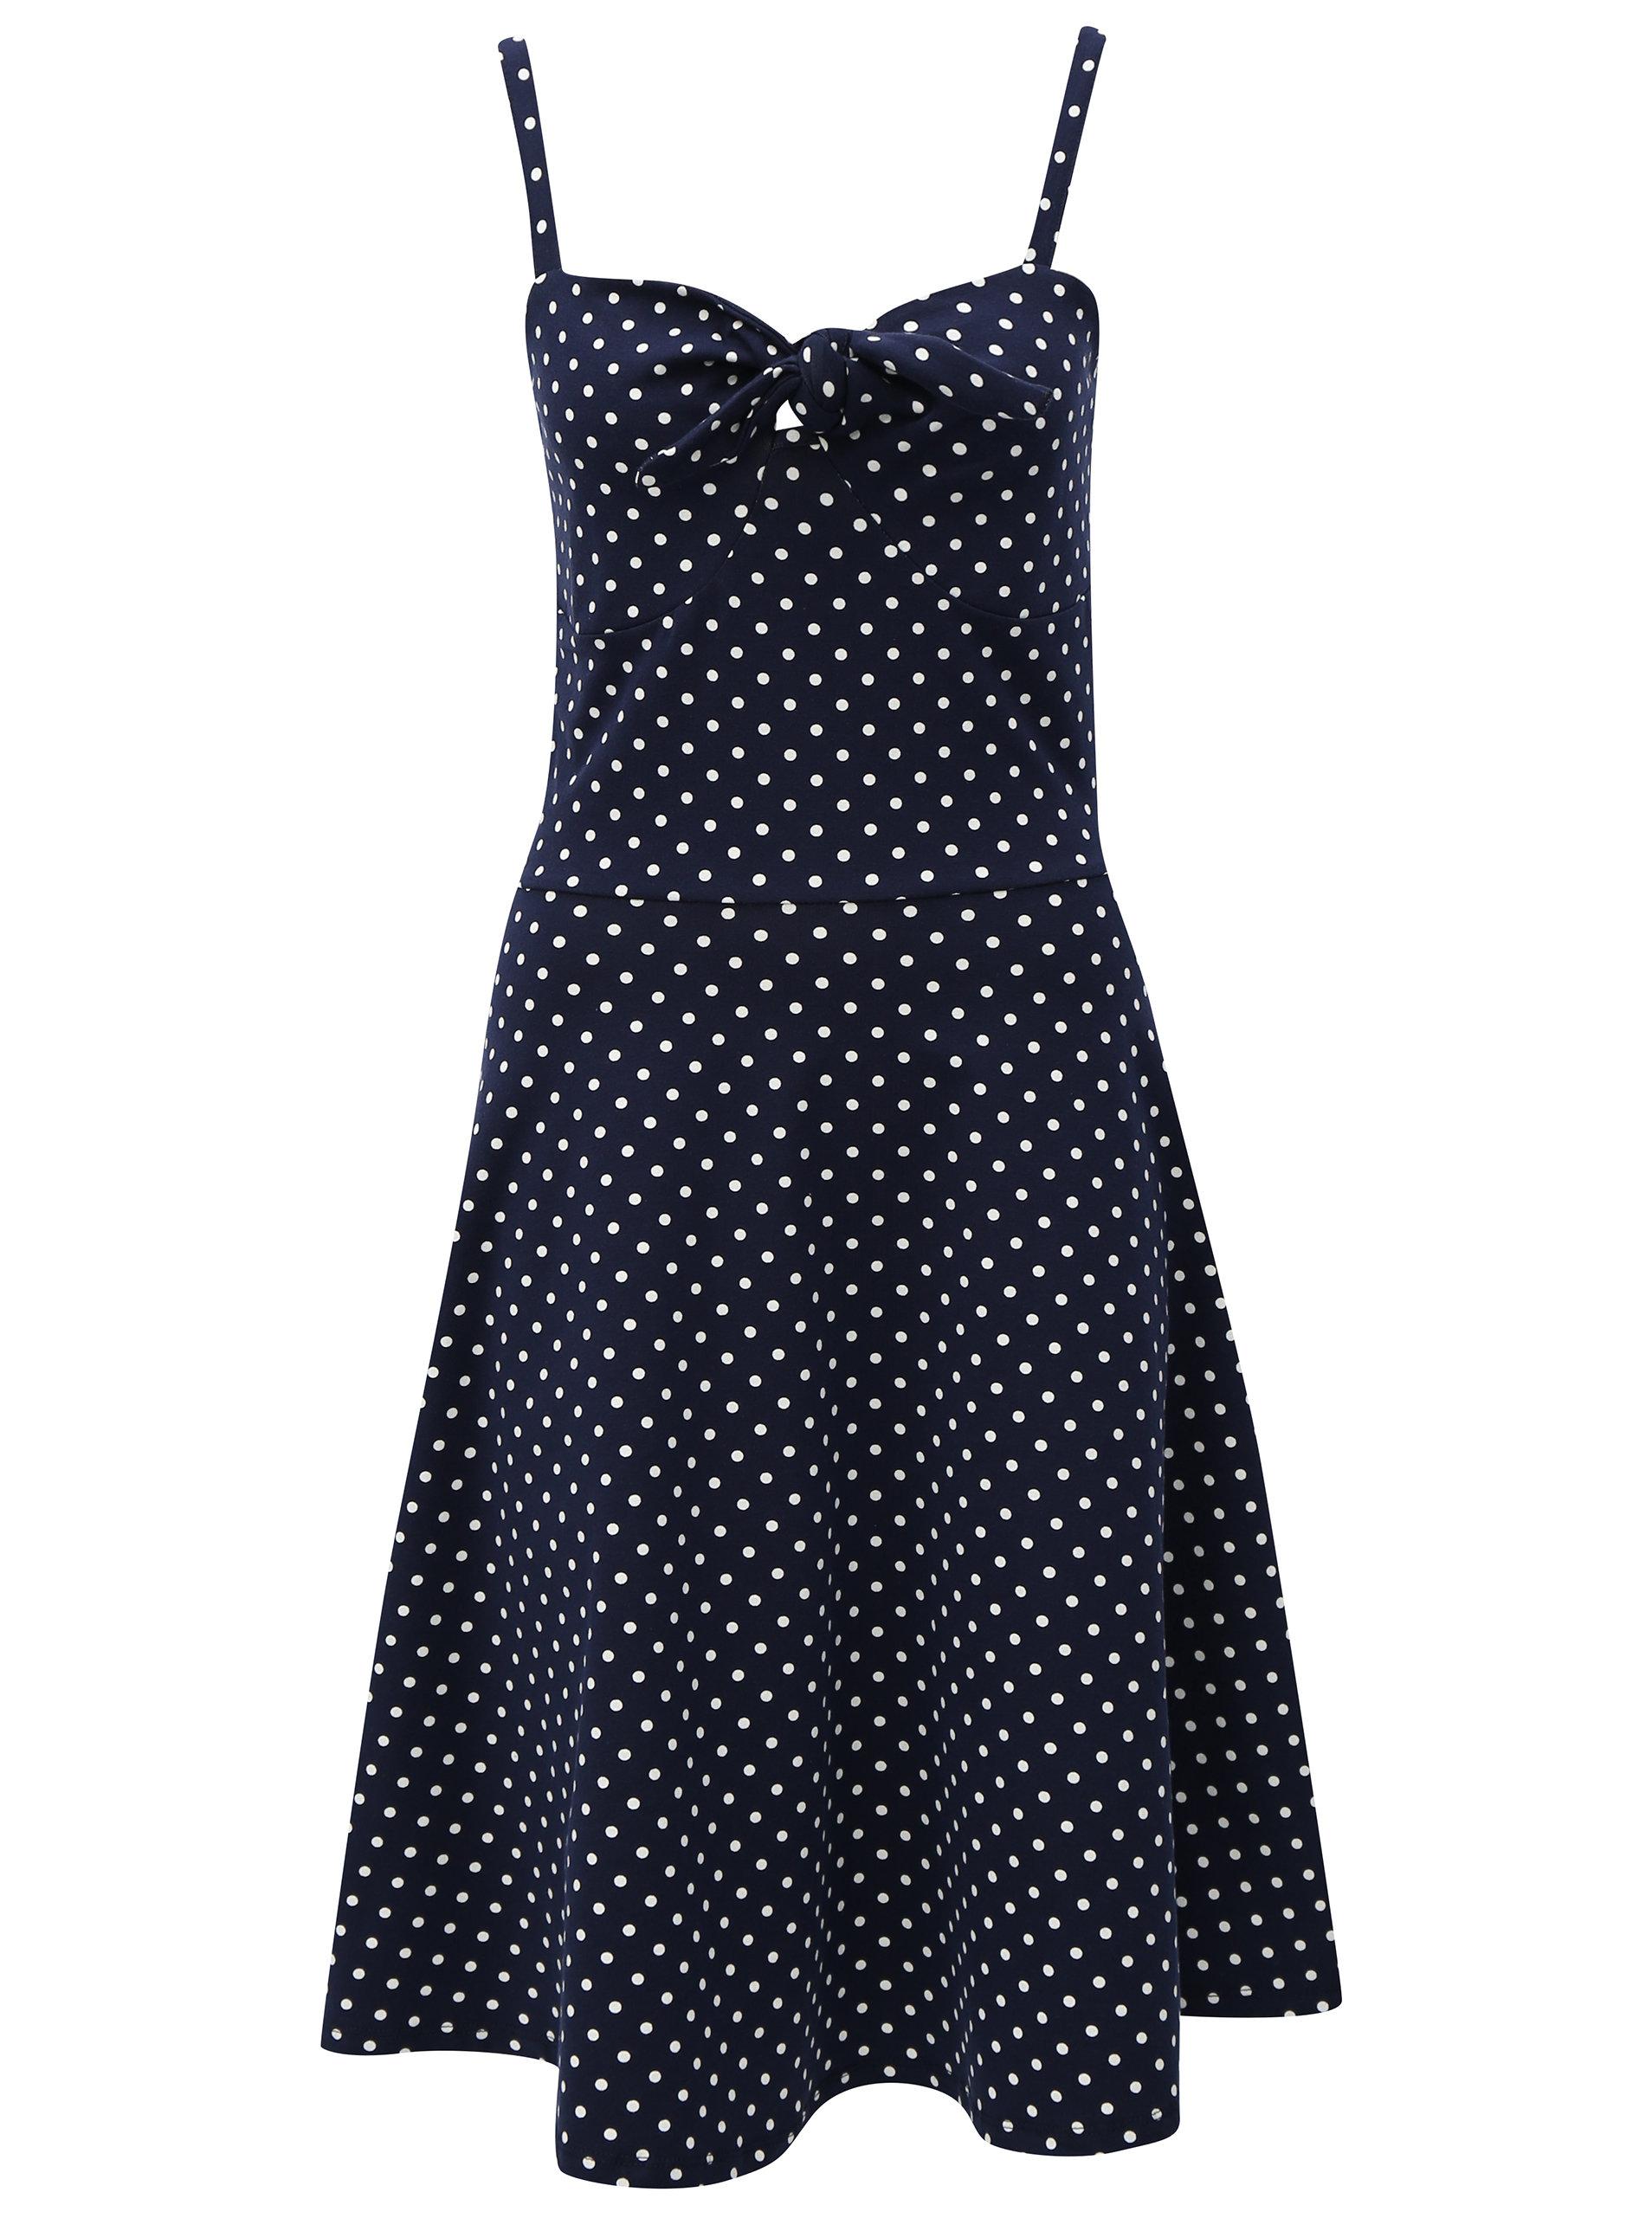 6aec8b0eadf2 Tmavě modré šaty s puntíky Dorothy Perkins Tall ...